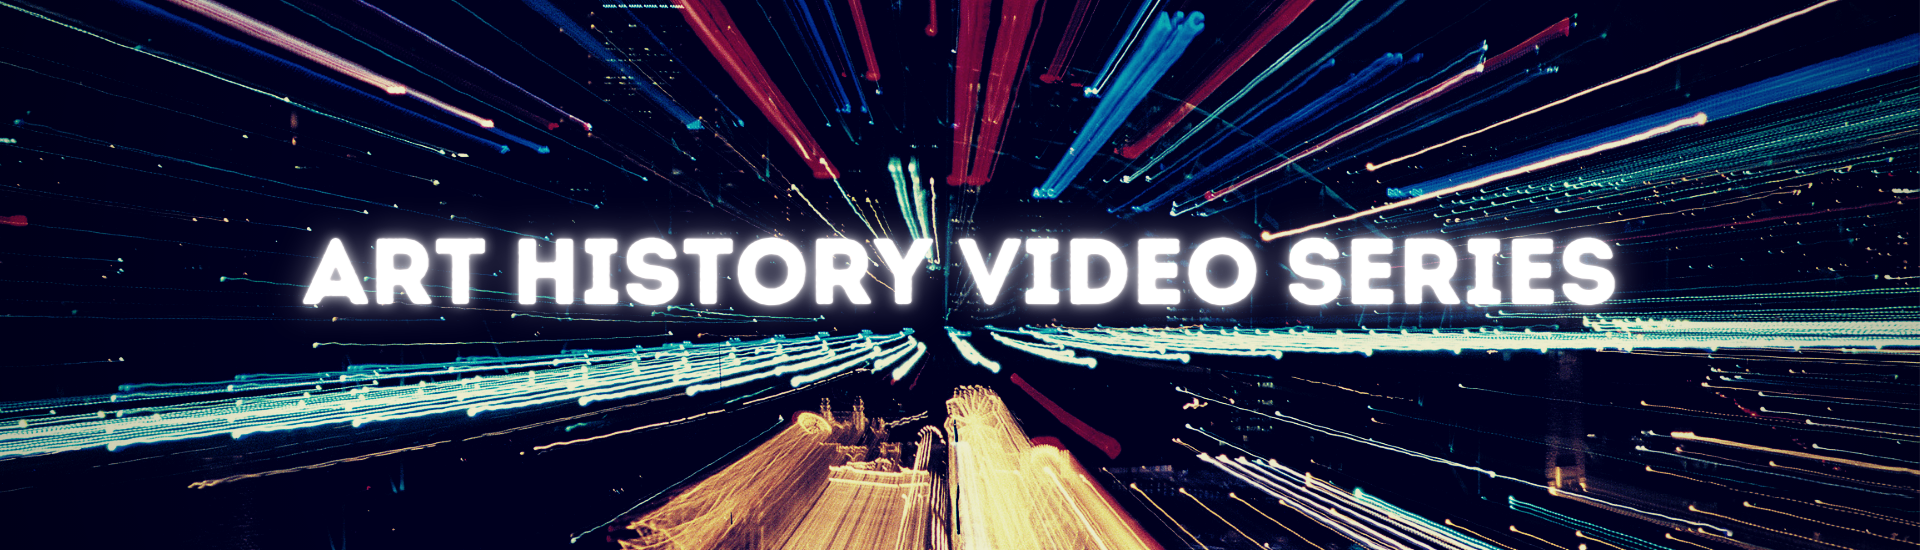 Art History Video Series Banner